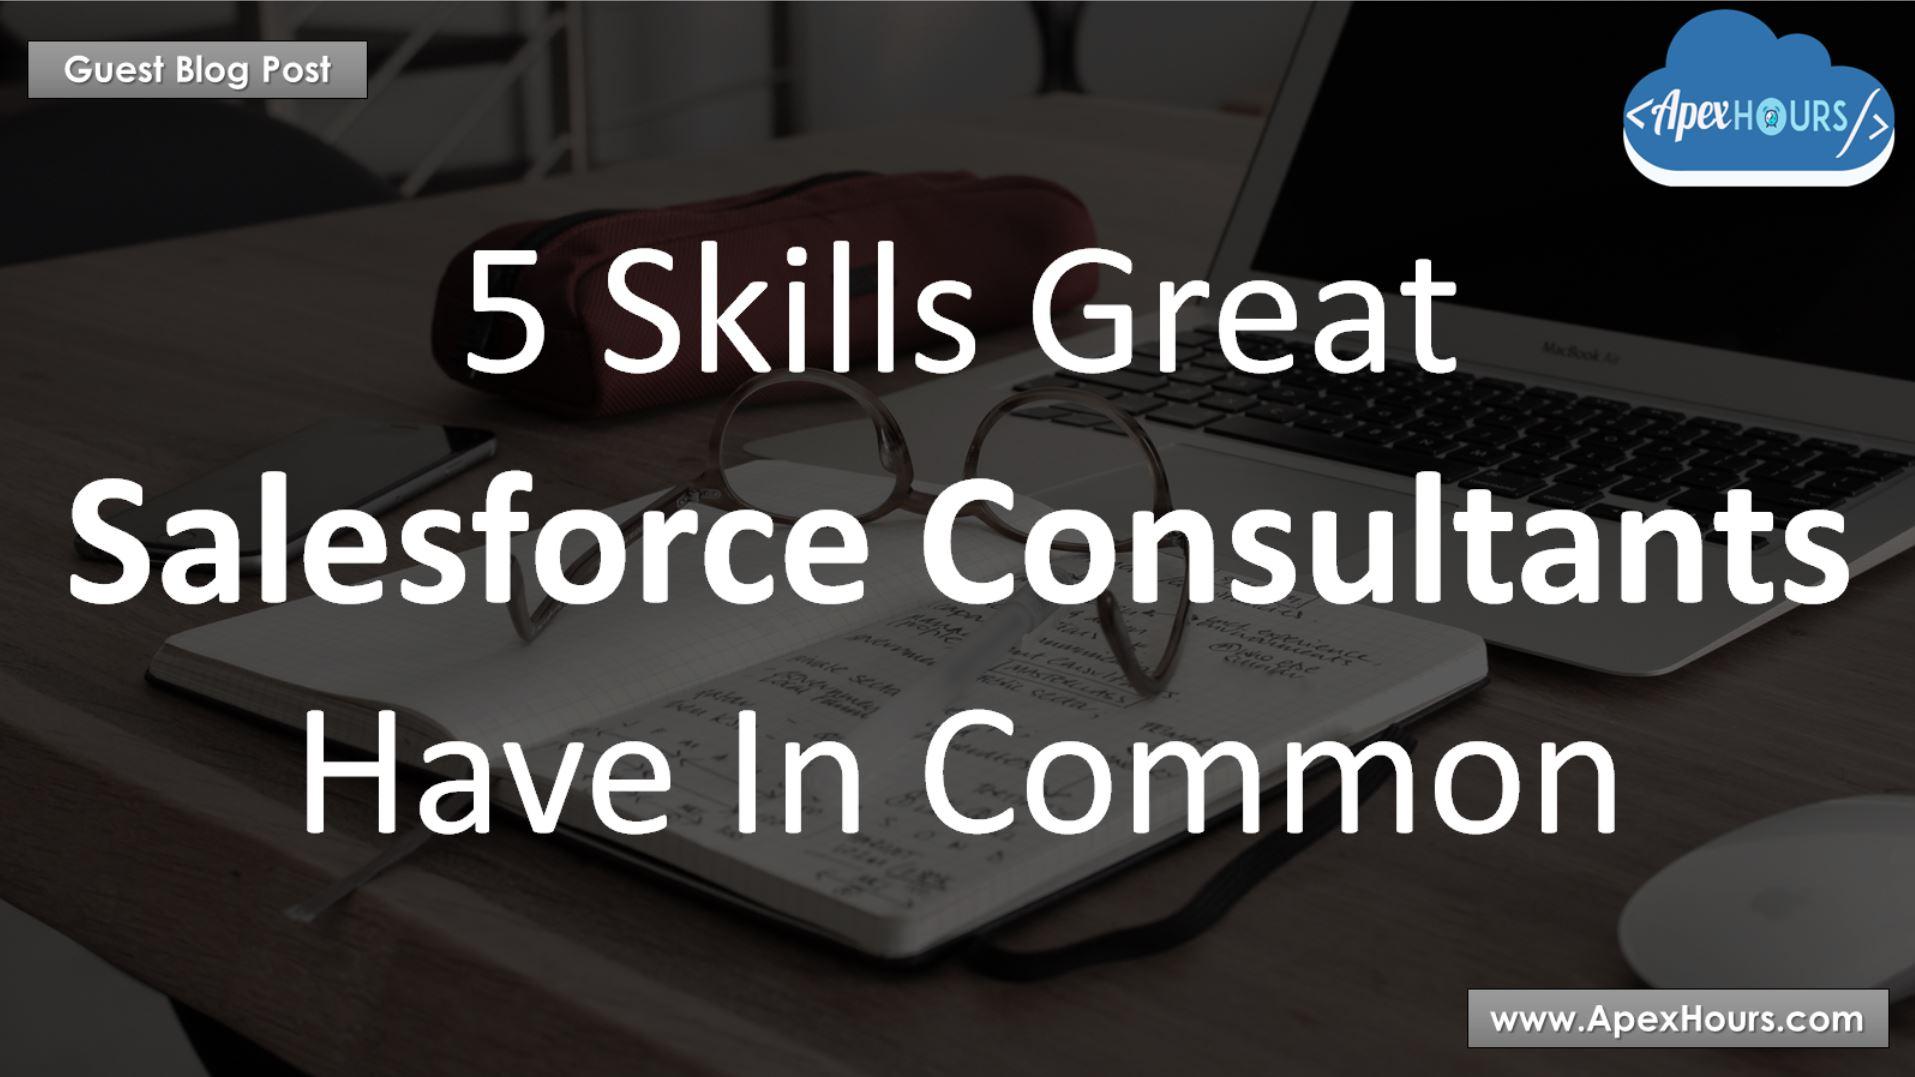 Salesforce Consultants Skills